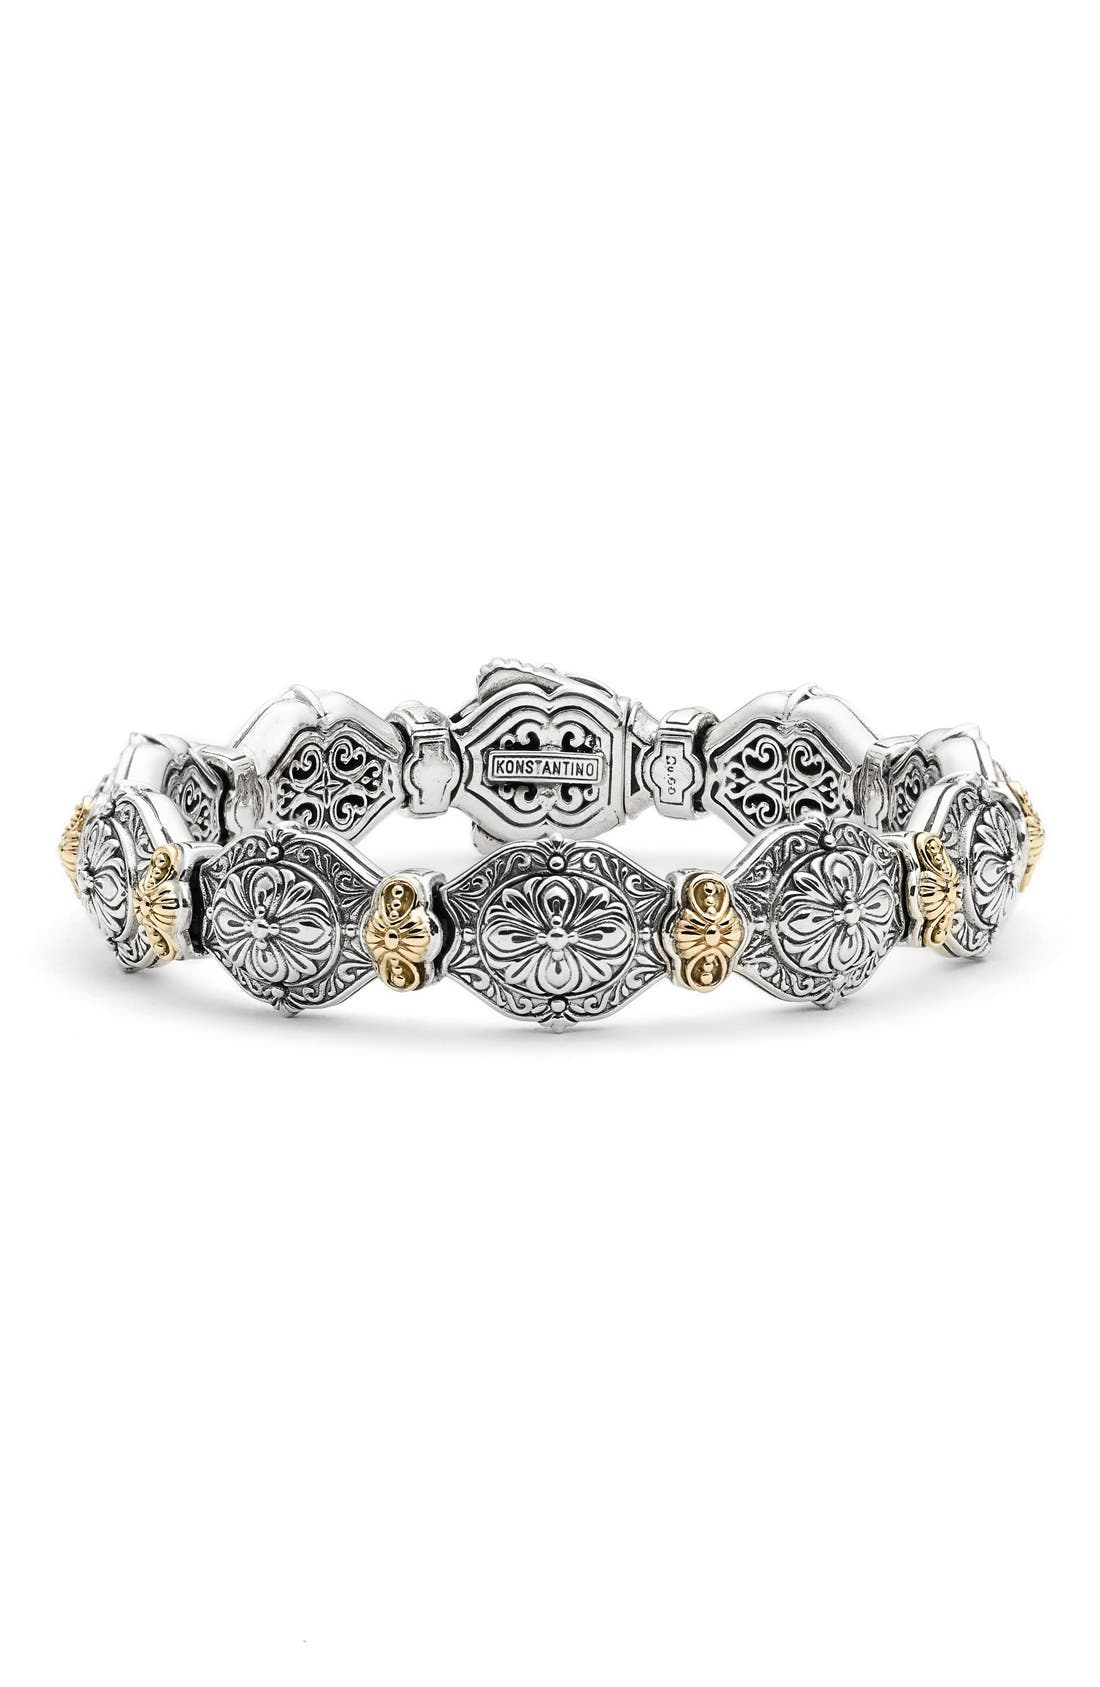 KONSTANTINO 'Silver & Gold Classics' Link Bracelet